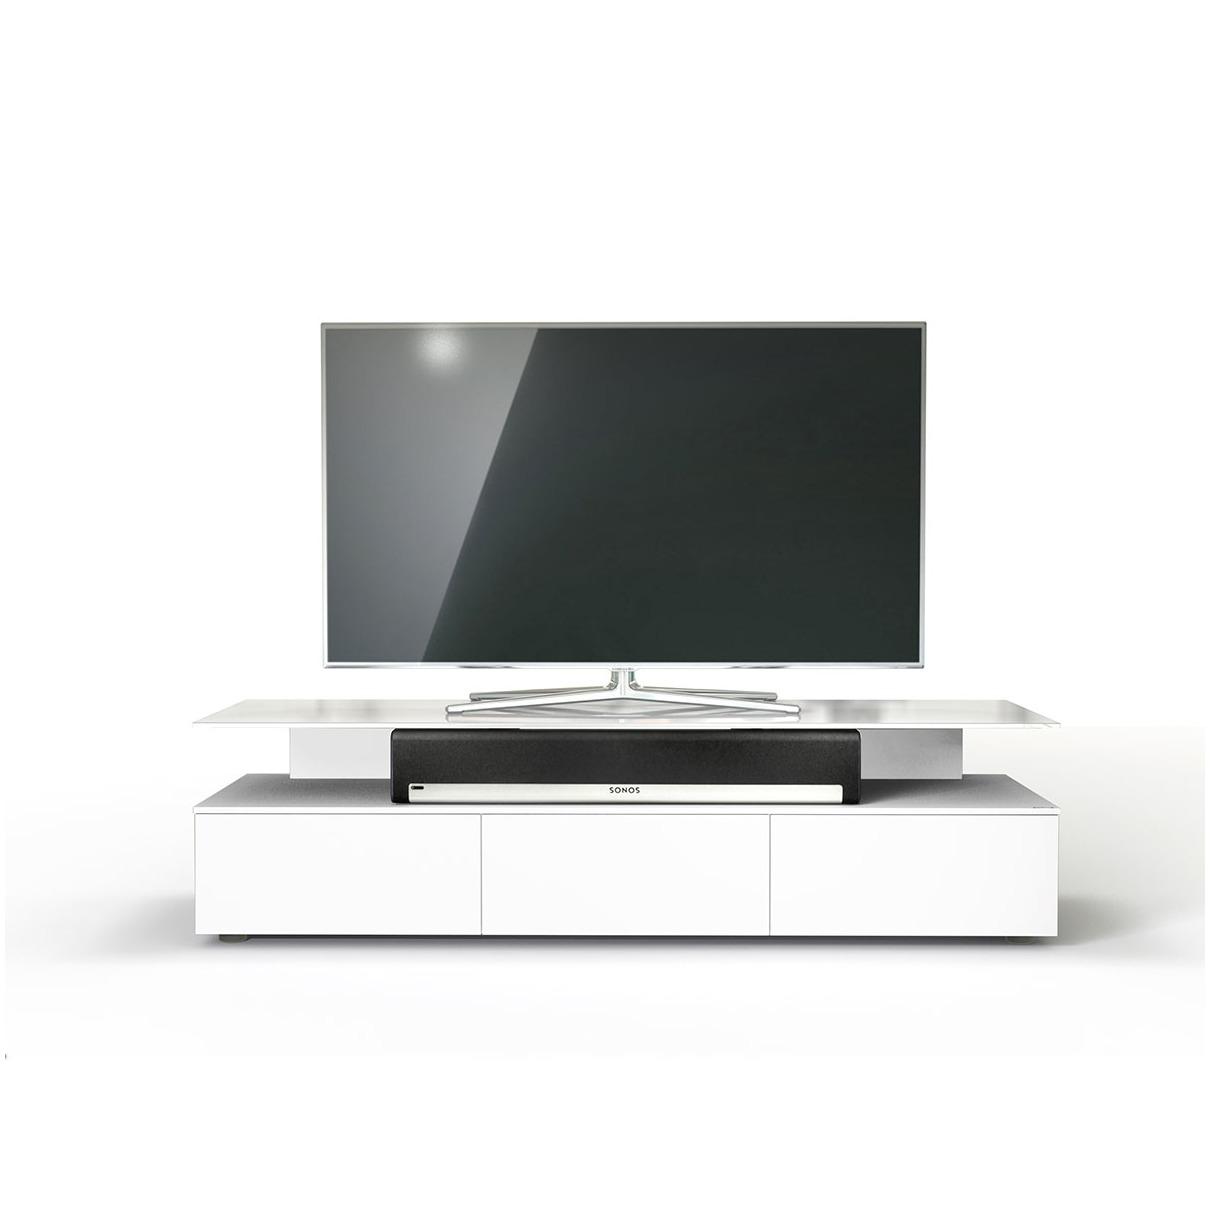 Afbeelding van Just Racks tv meubel JRM1650-SNG